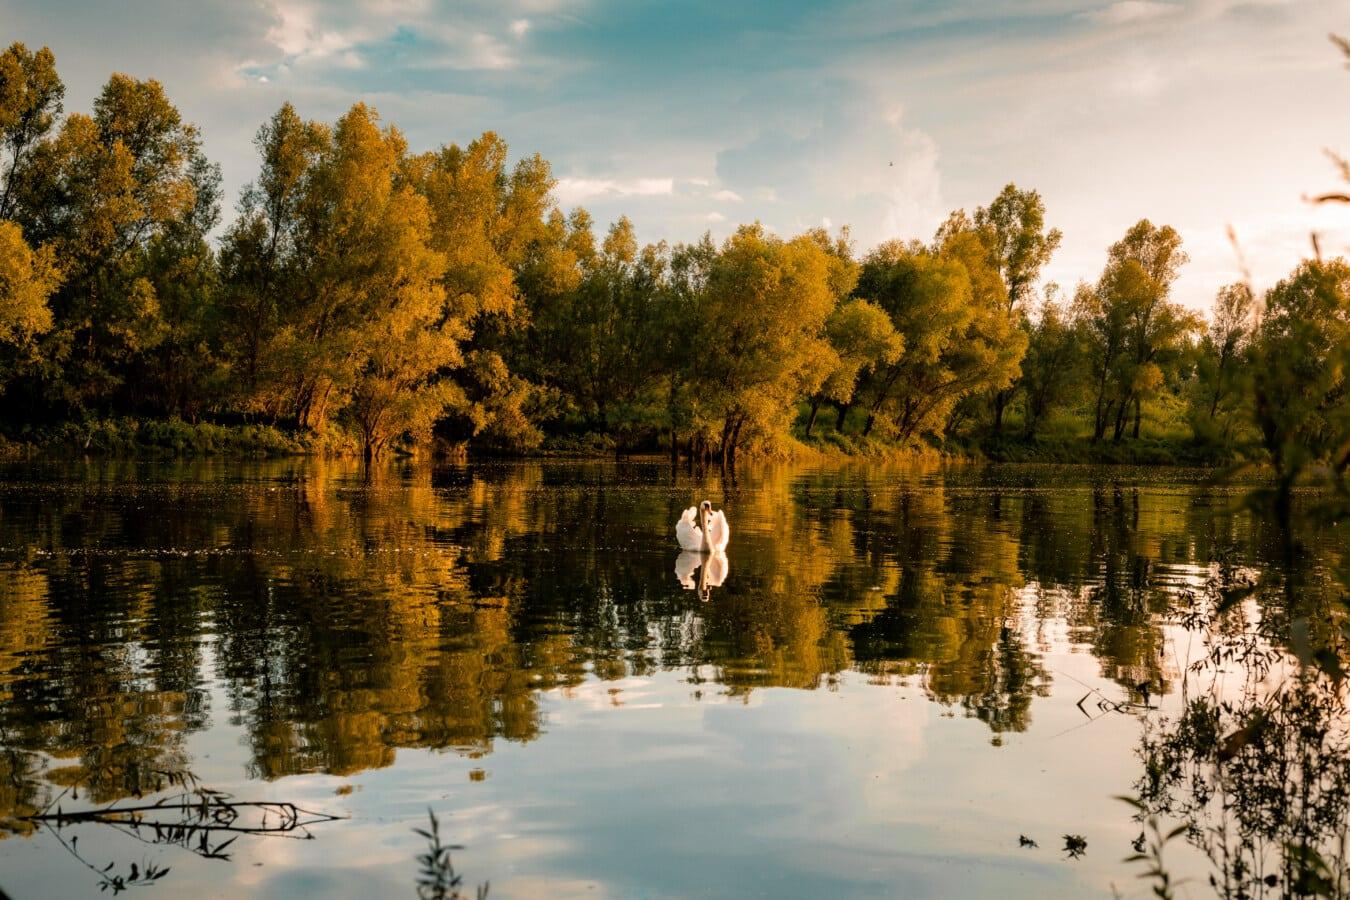 Herbst, See, Reflexion, Sumpf, Schwimmbad, Bäume, Wald, Struktur, Wasser, Landschaft